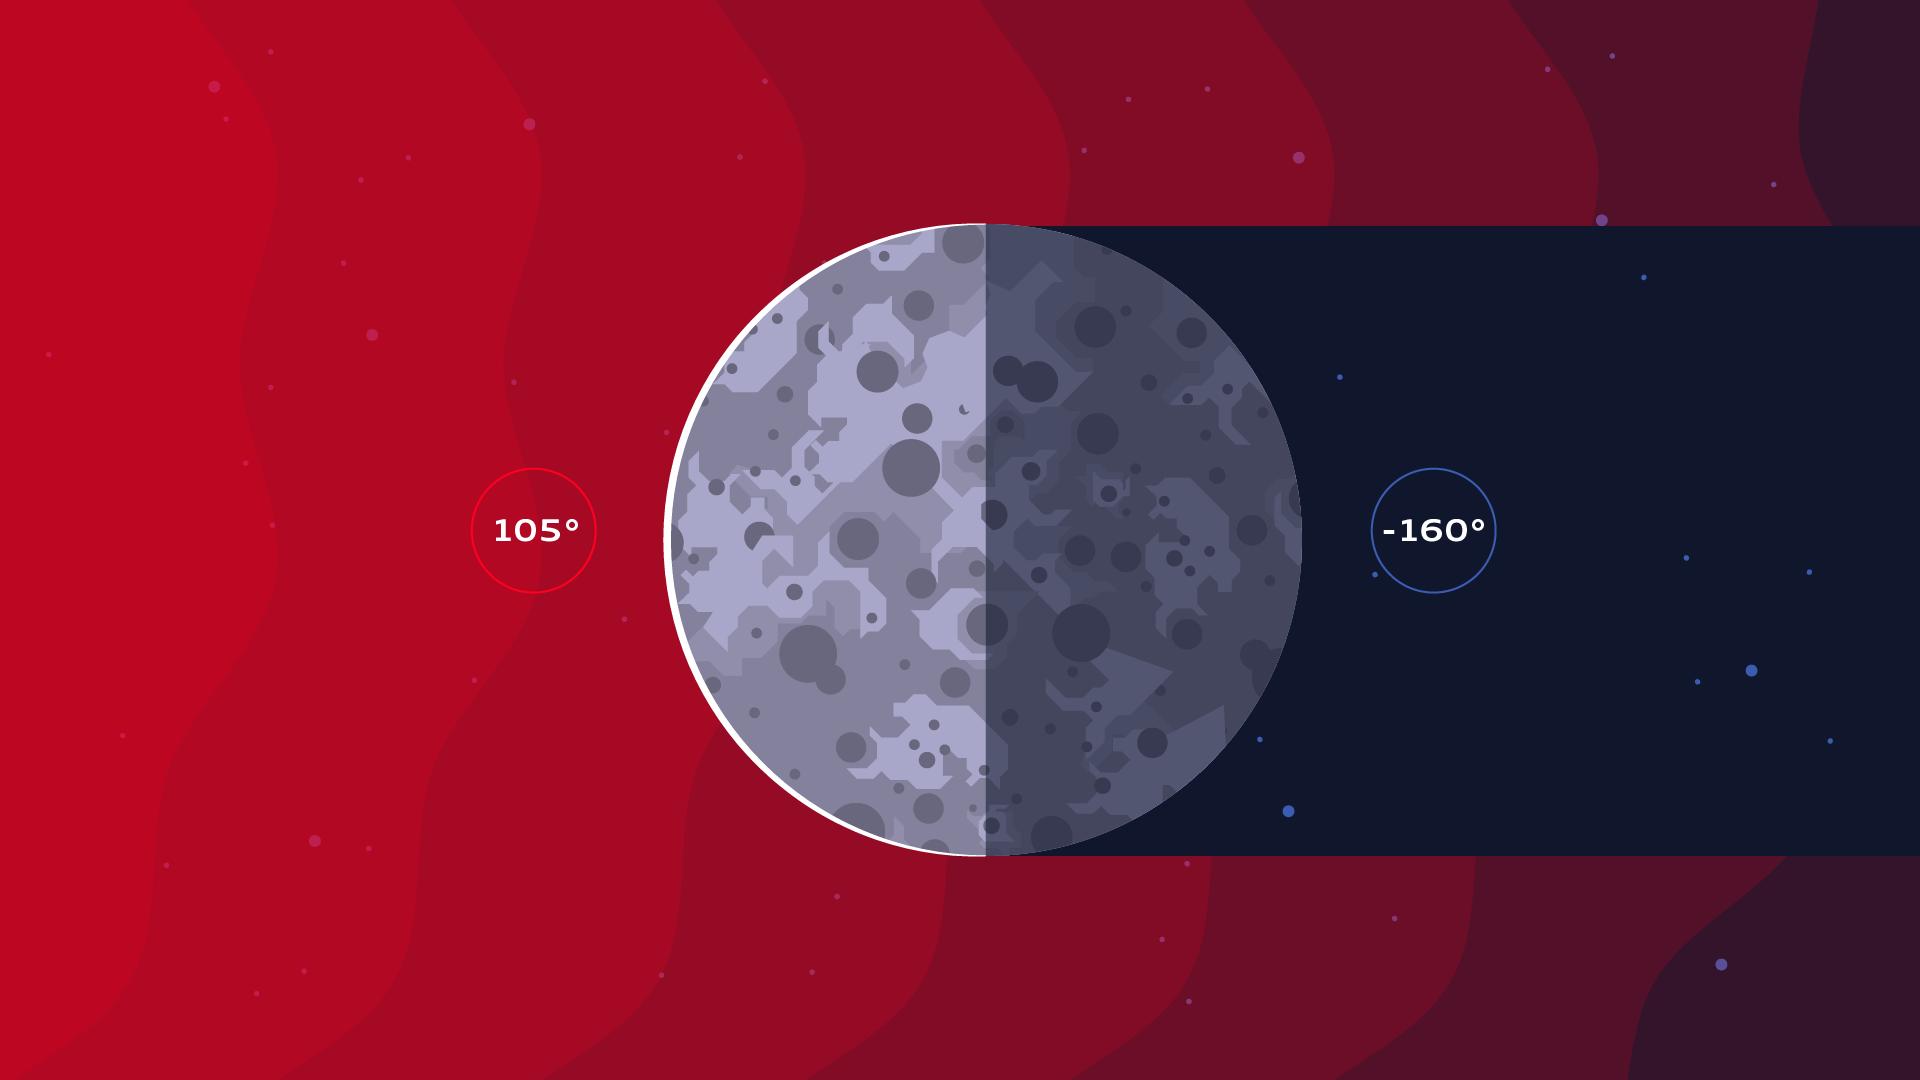 inanutshell-kurzgesagt-audi-mission-to-moon-05